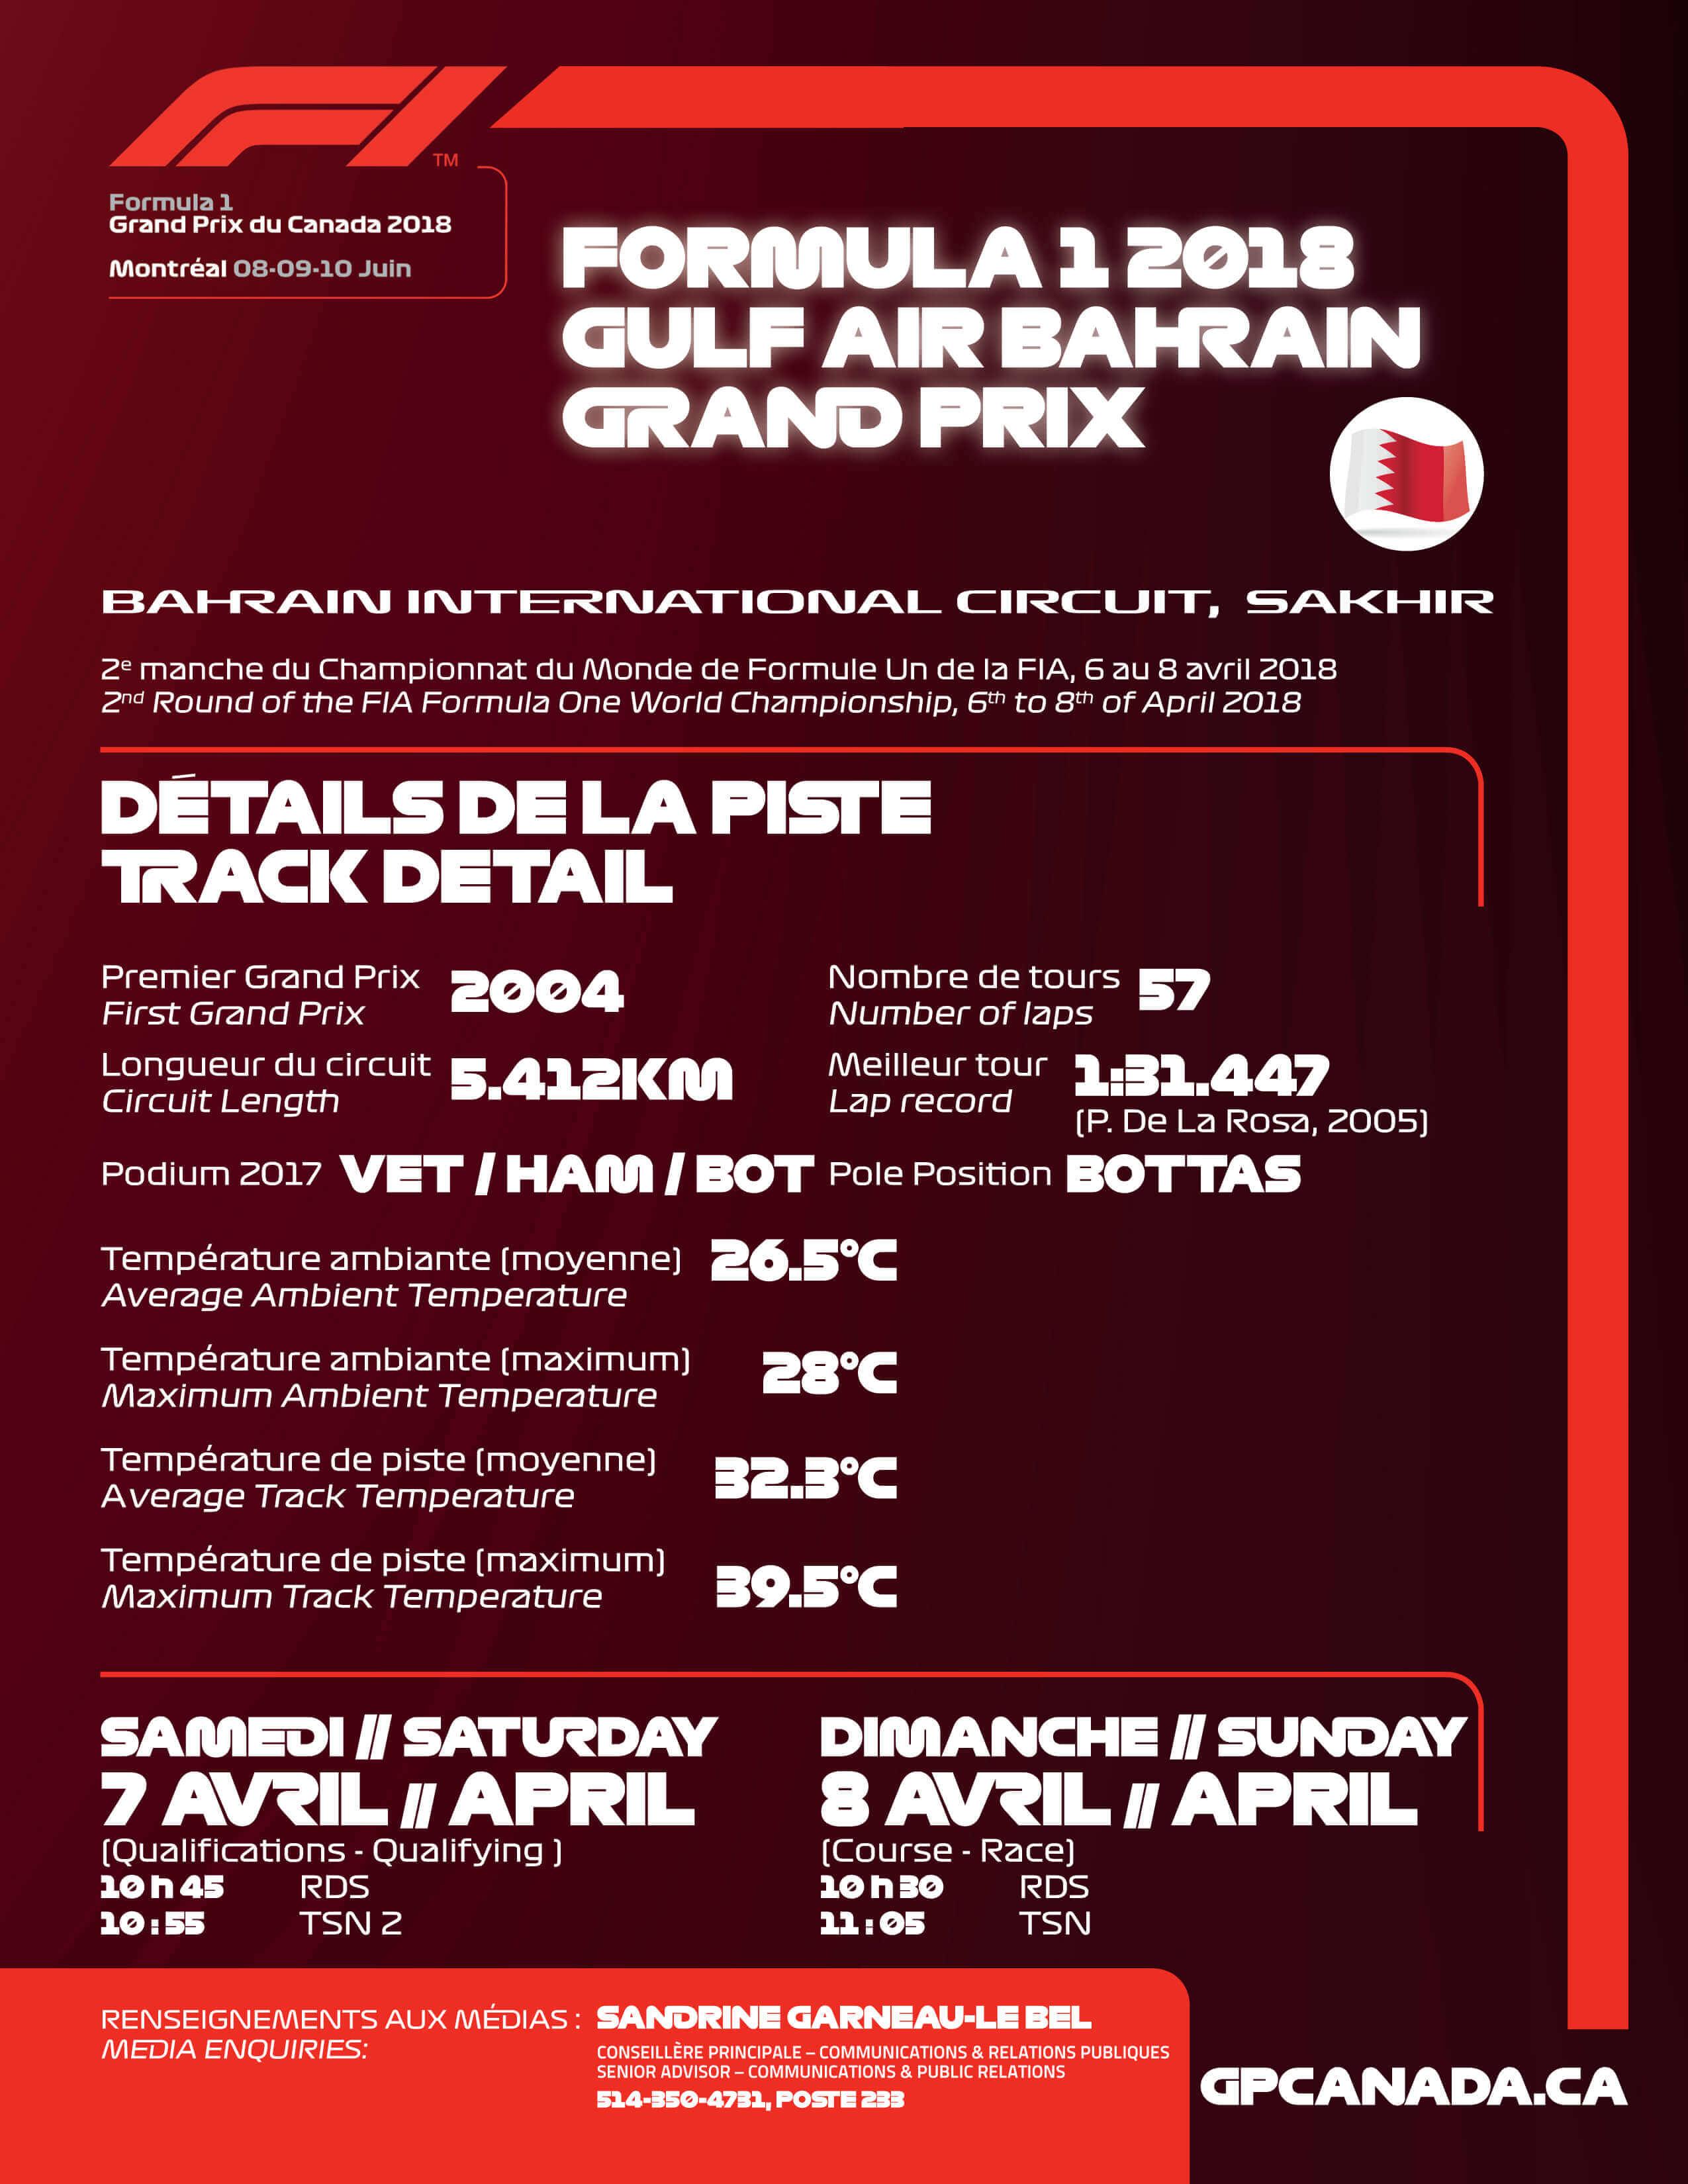 info formula 1 2018 gulf air bahrain grand prix formula 1 grand prix du canada circuit. Black Bedroom Furniture Sets. Home Design Ideas